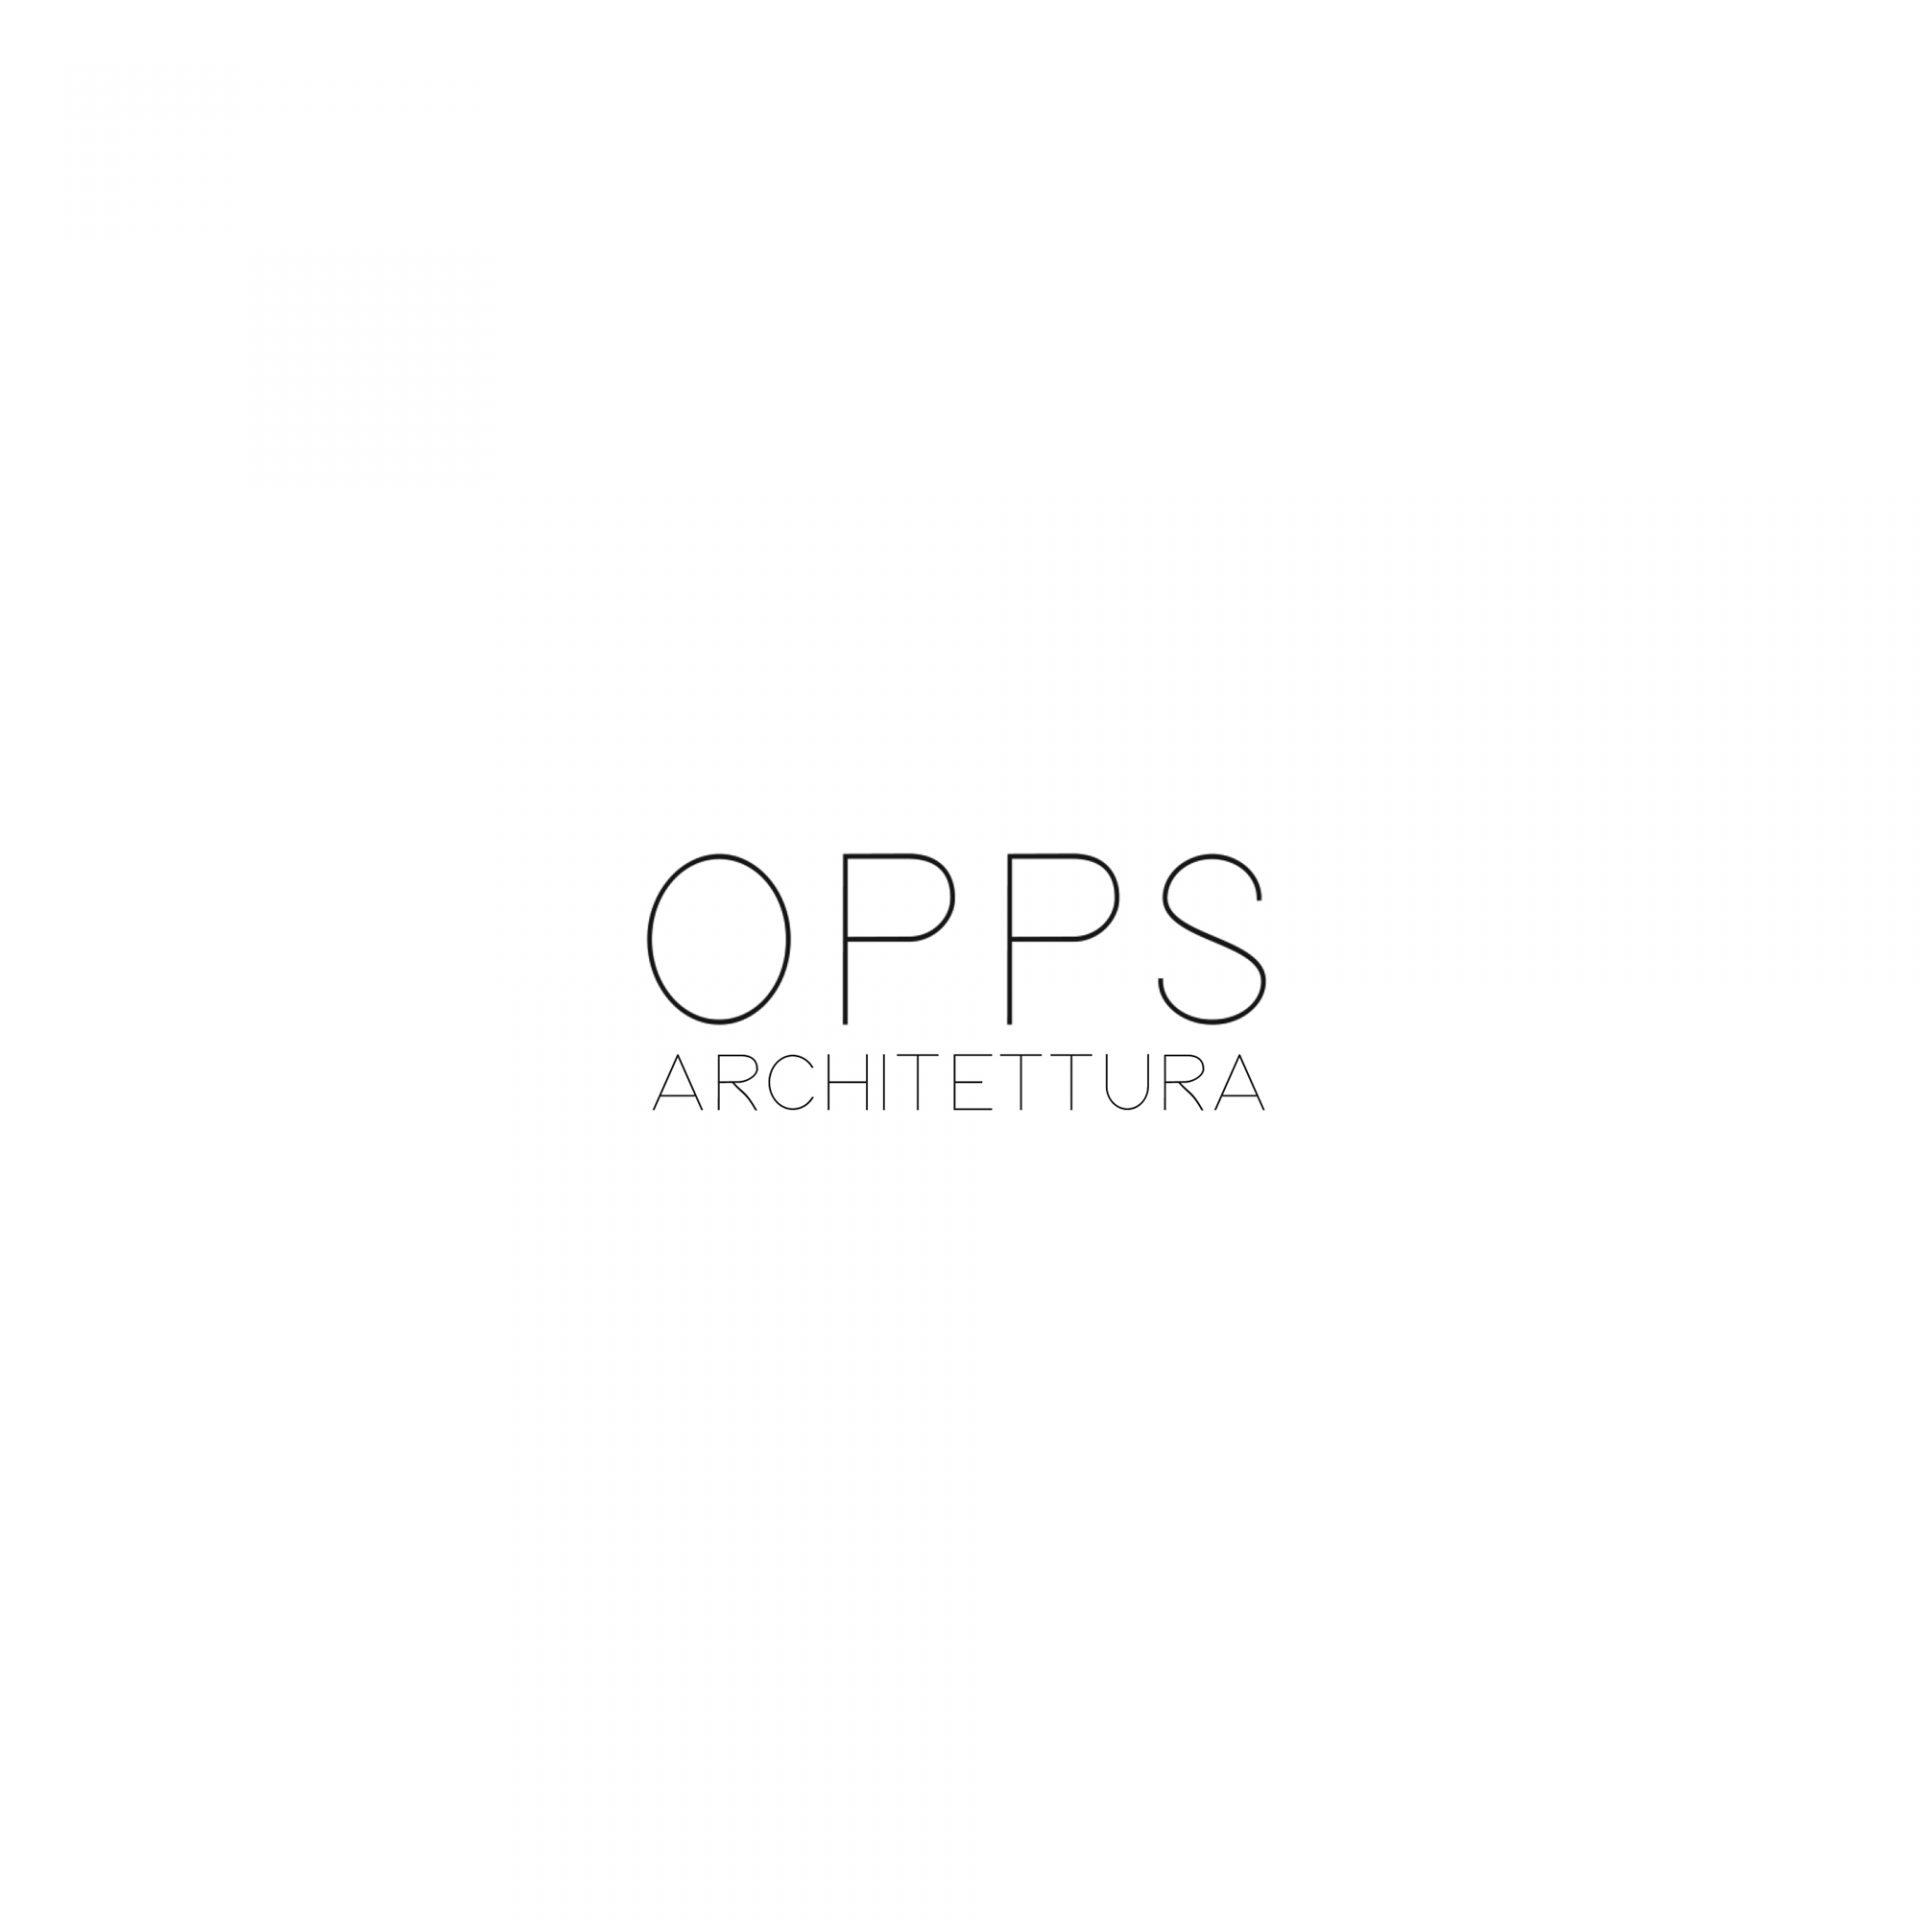 OPPS architettura